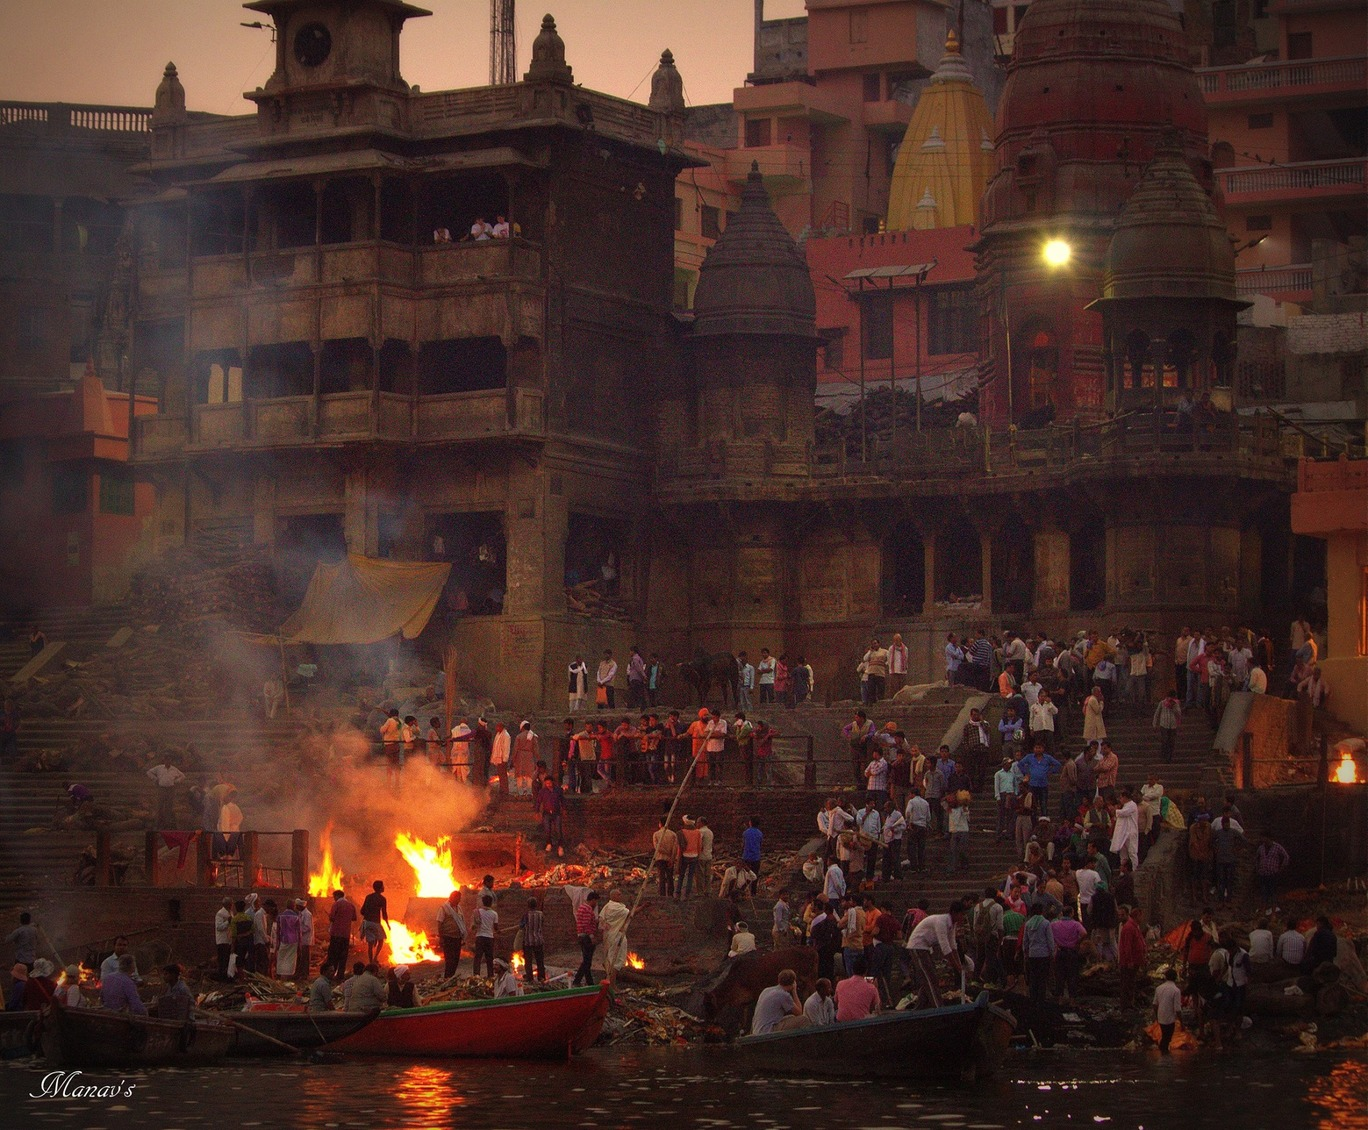 Varanasi---Celebration of death by Manuhar Jainn | Tripoto Celebration Of Death